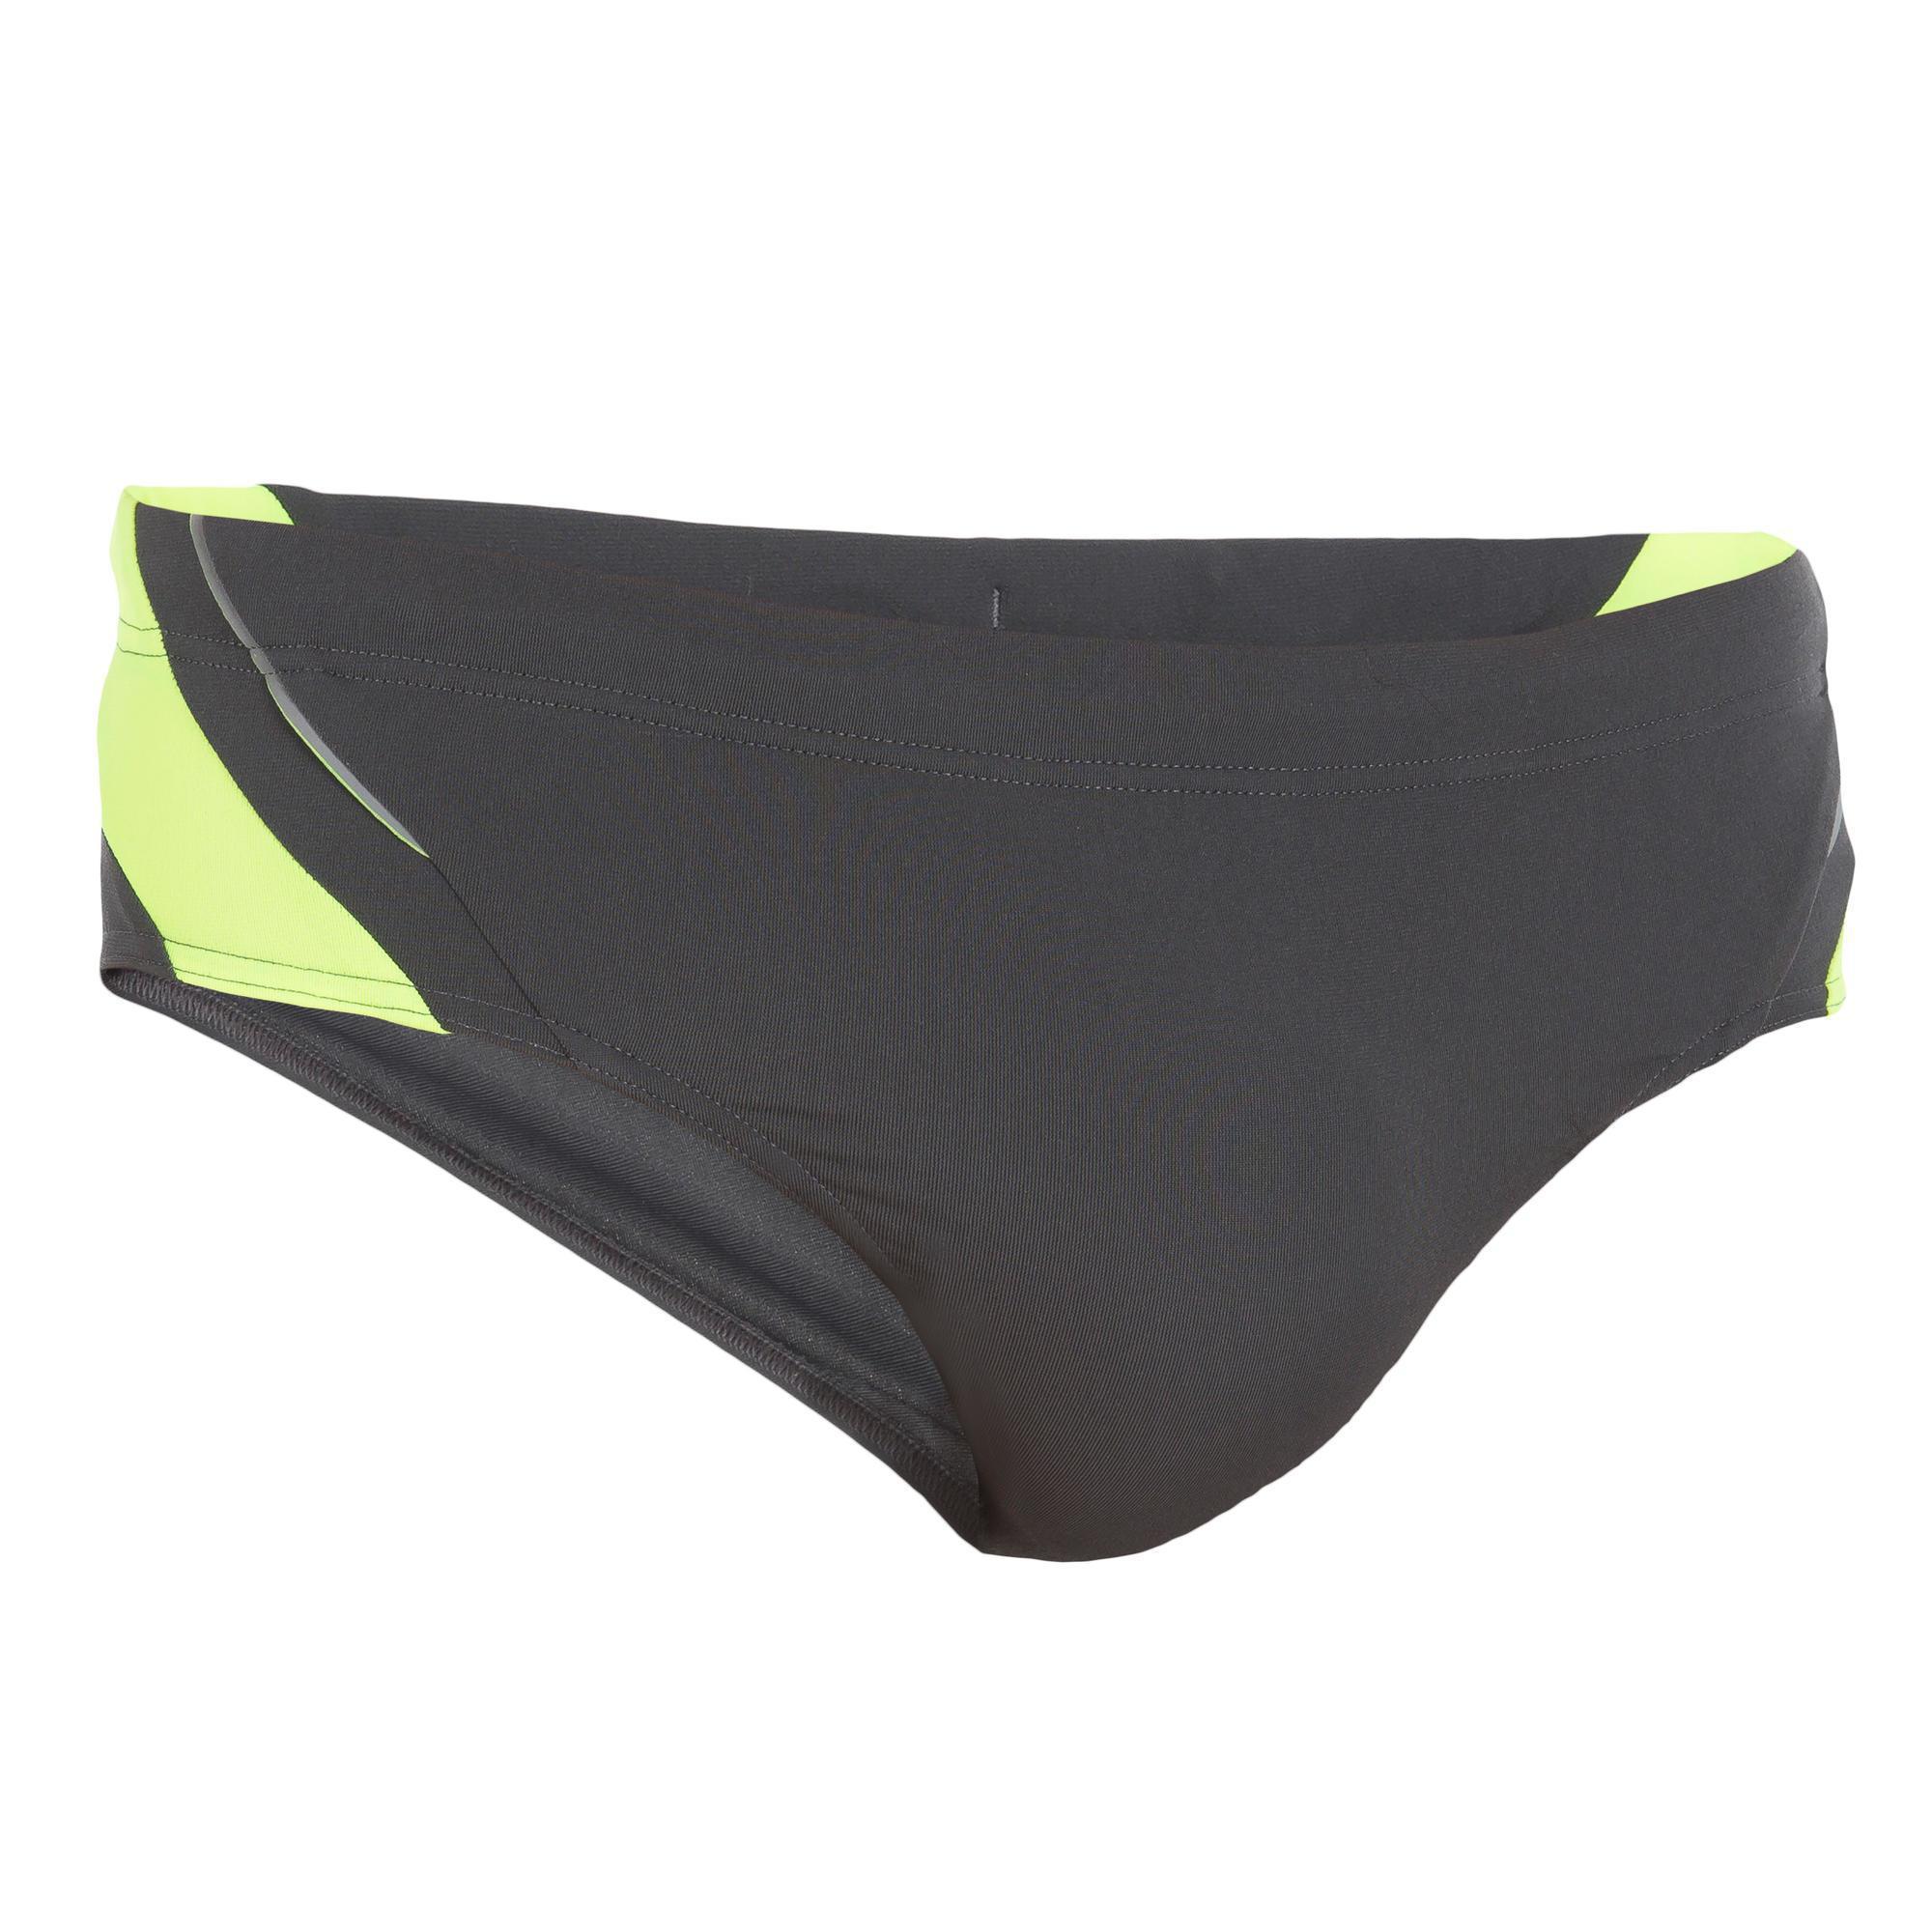 Maillot de bain homme slip b sporty yoke gris italie nabaiji - Decathlon costumi piscina ...